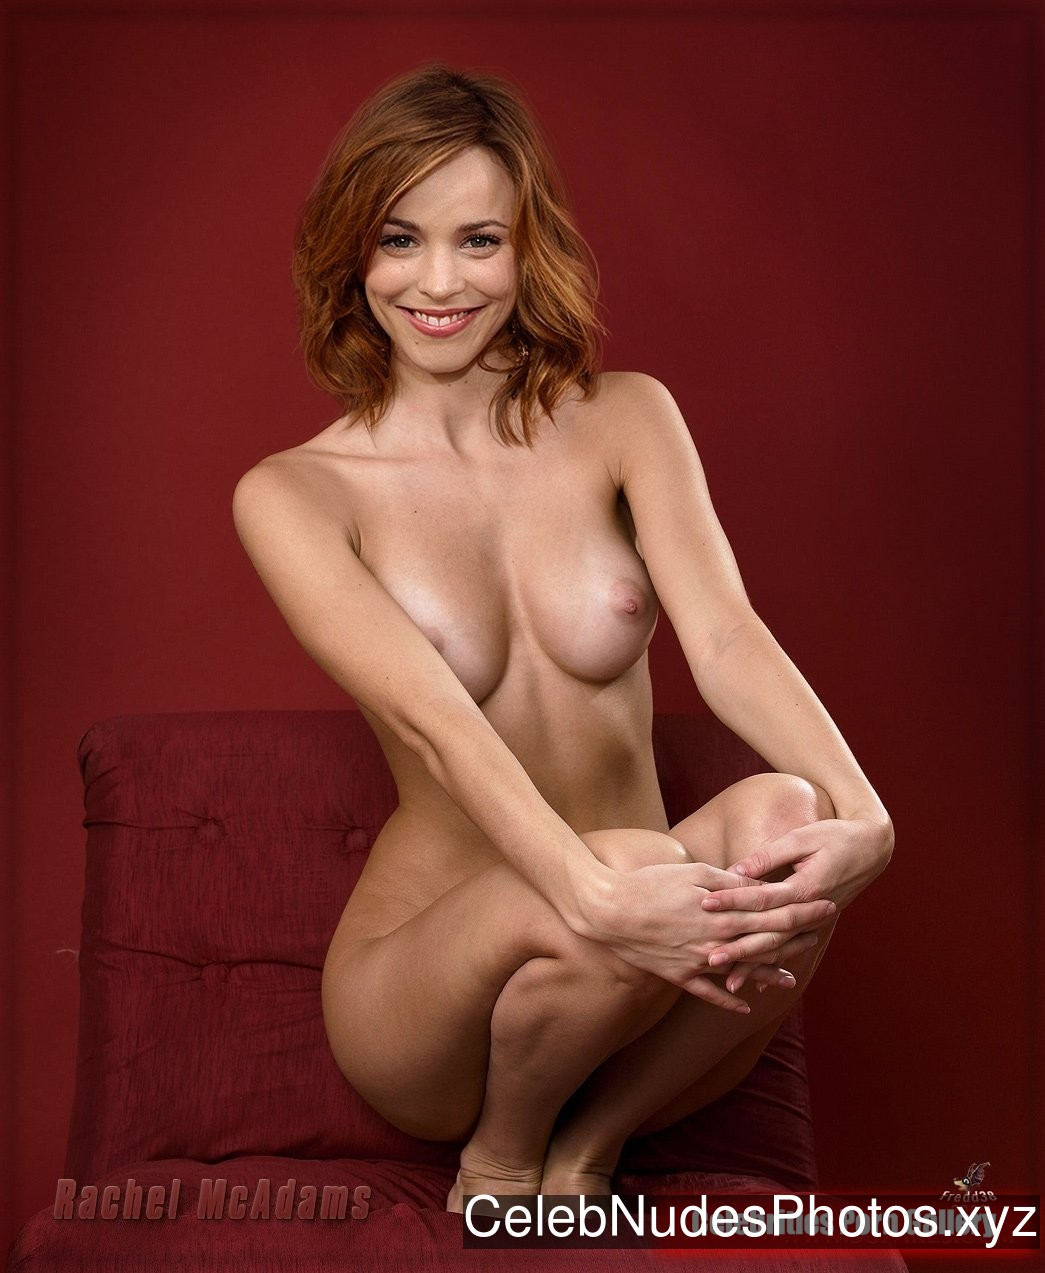 rachel mcadams nude photos